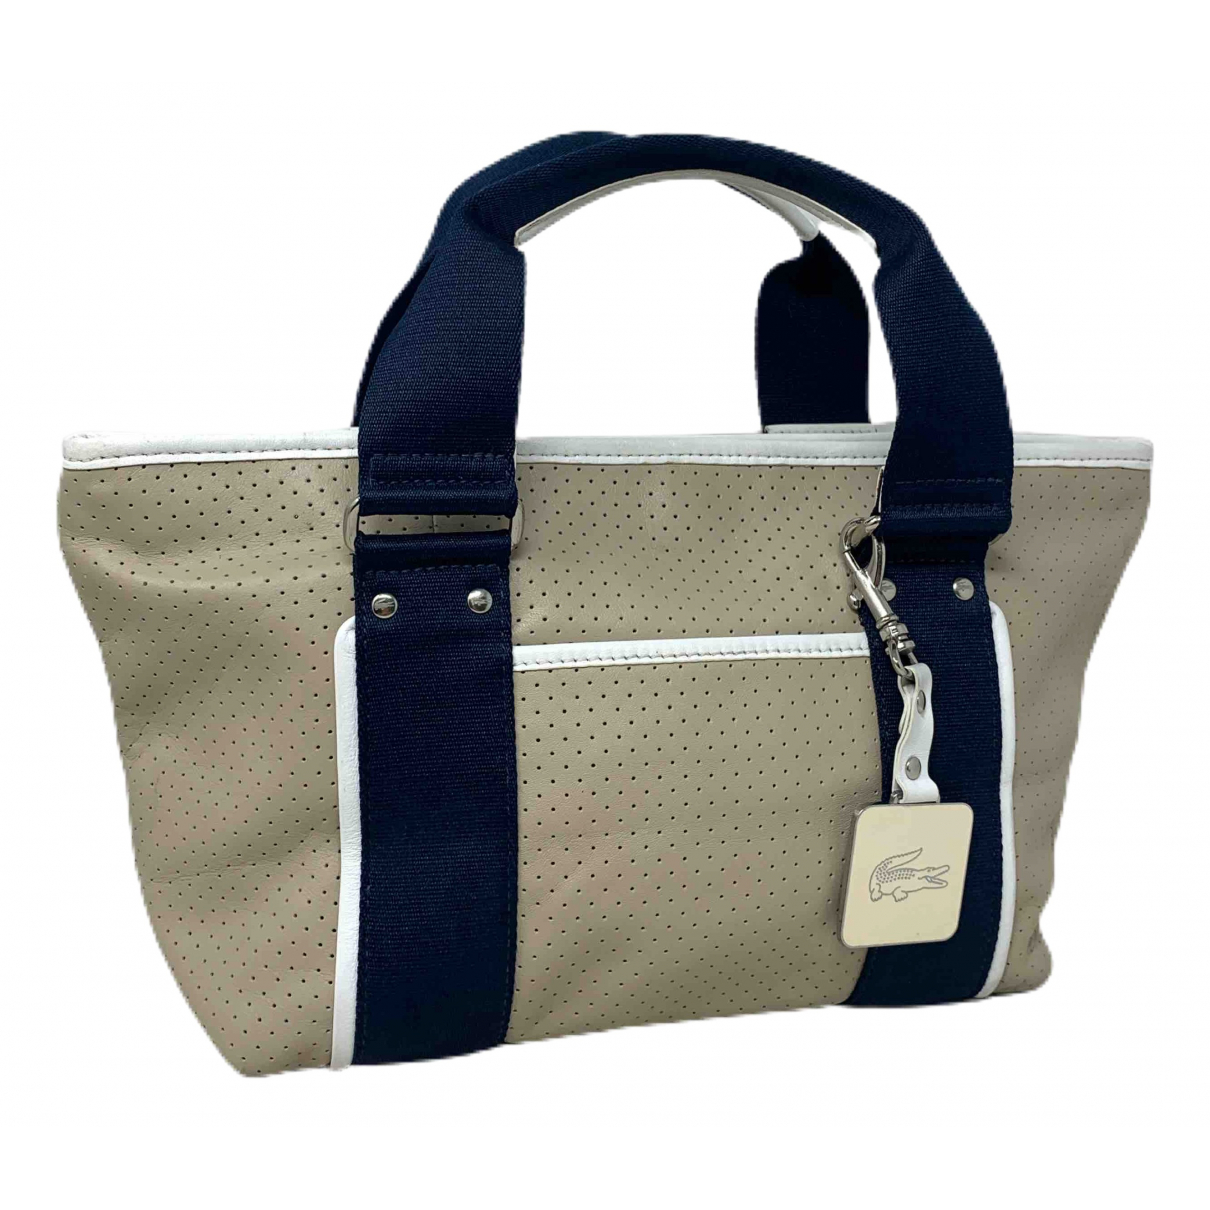 Lacoste \N Handtasche in  Beige Leder